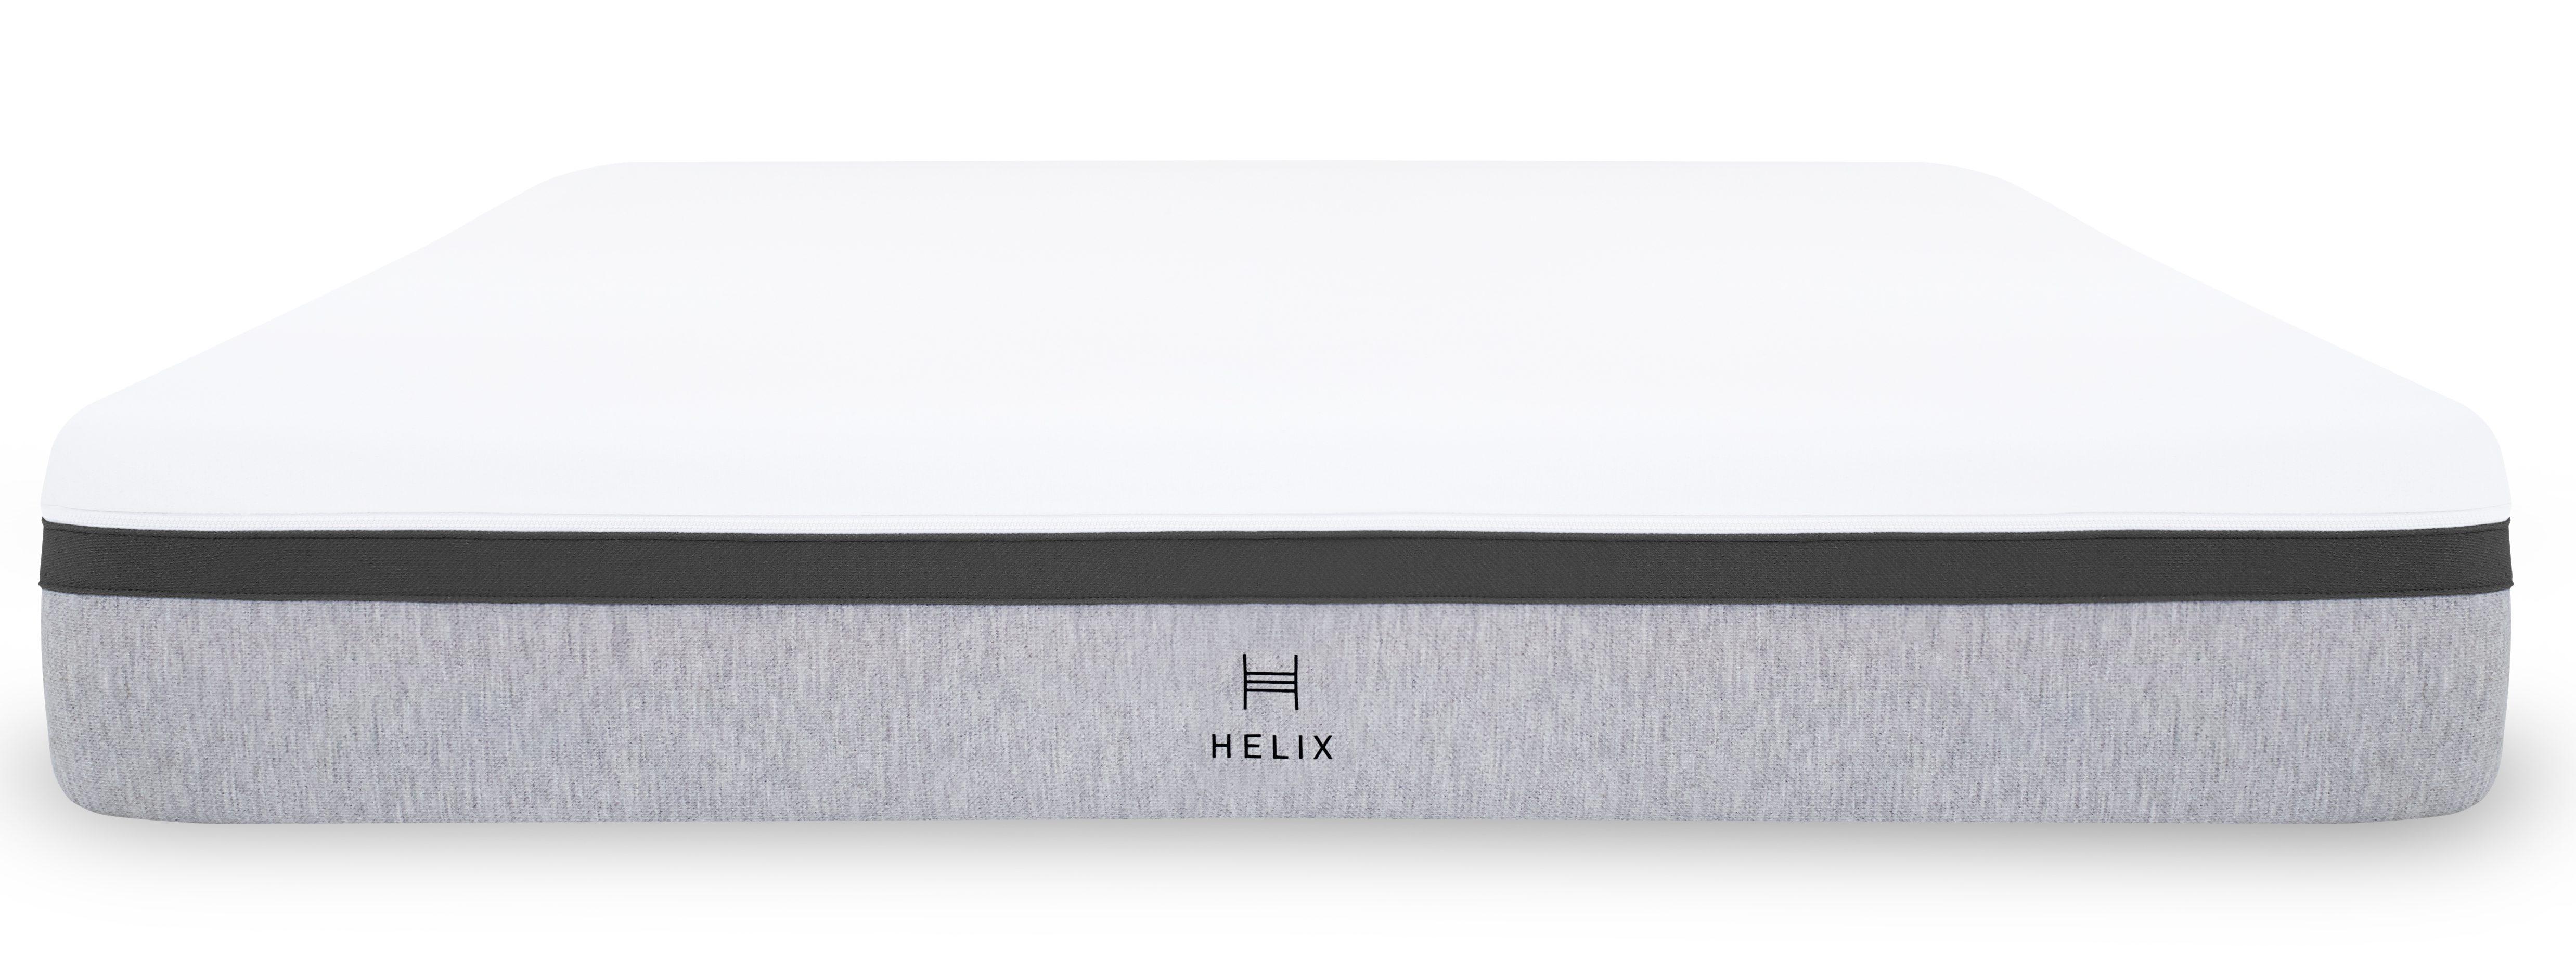 The Helix Nightfall